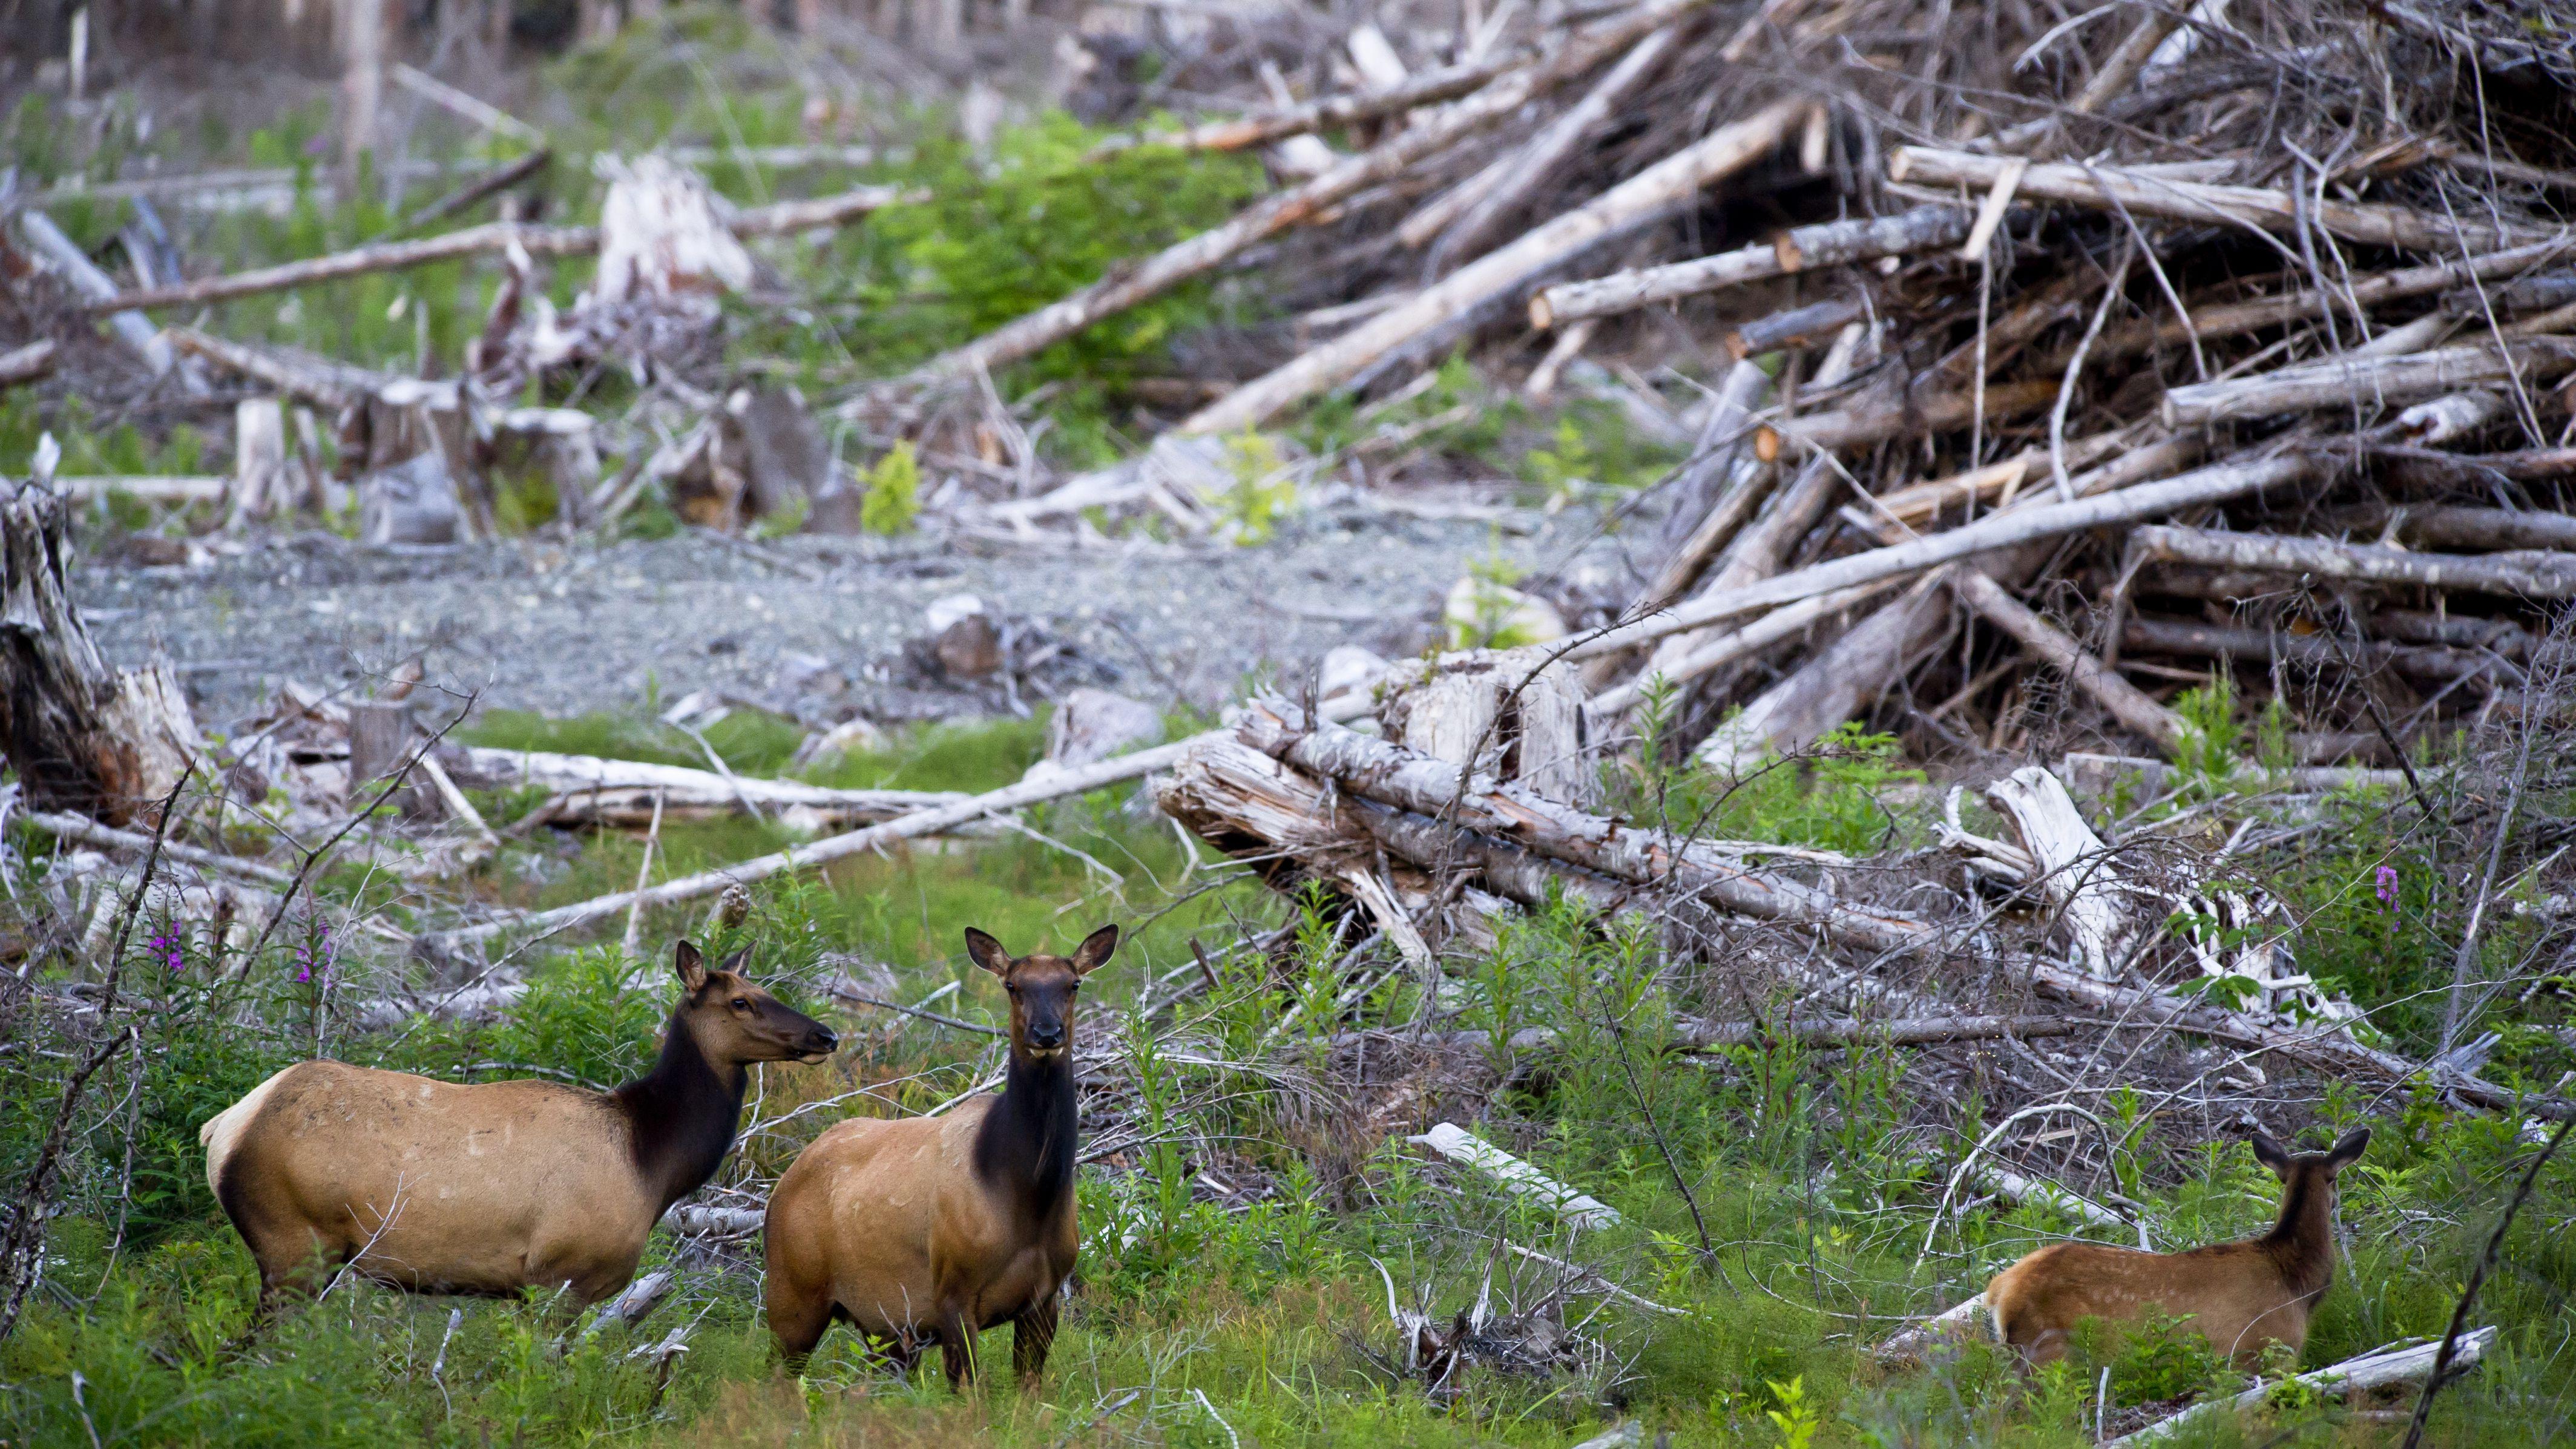 Habitat Loss, Fragmentation, and Destruction